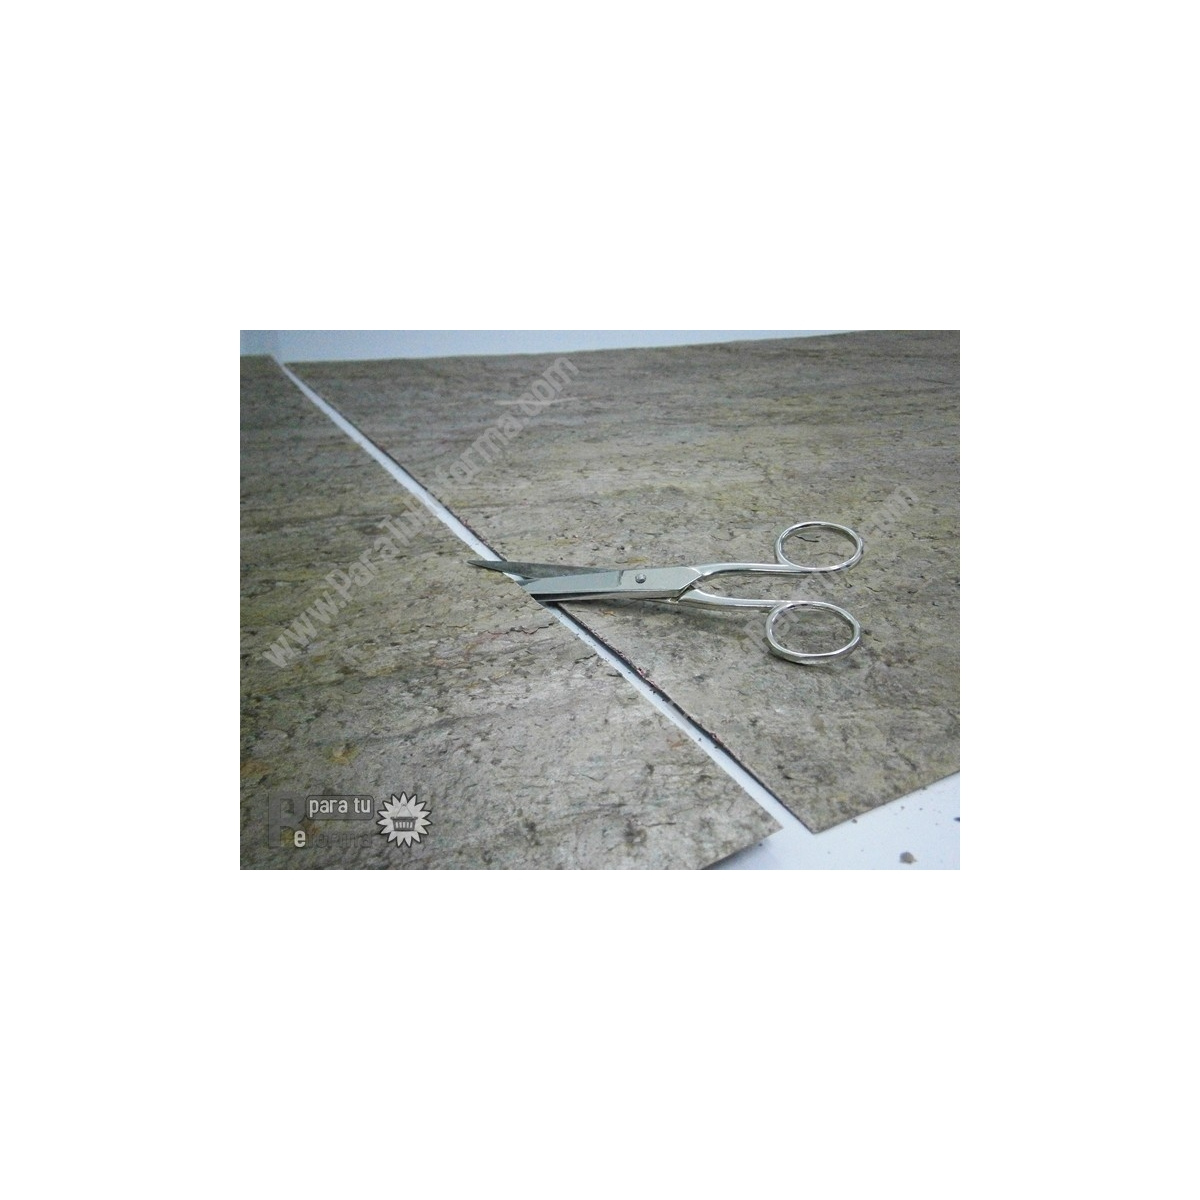 Pizarra natural flexible FS6004 / FT3004 - Revestimiento con Pizarra natural flexible